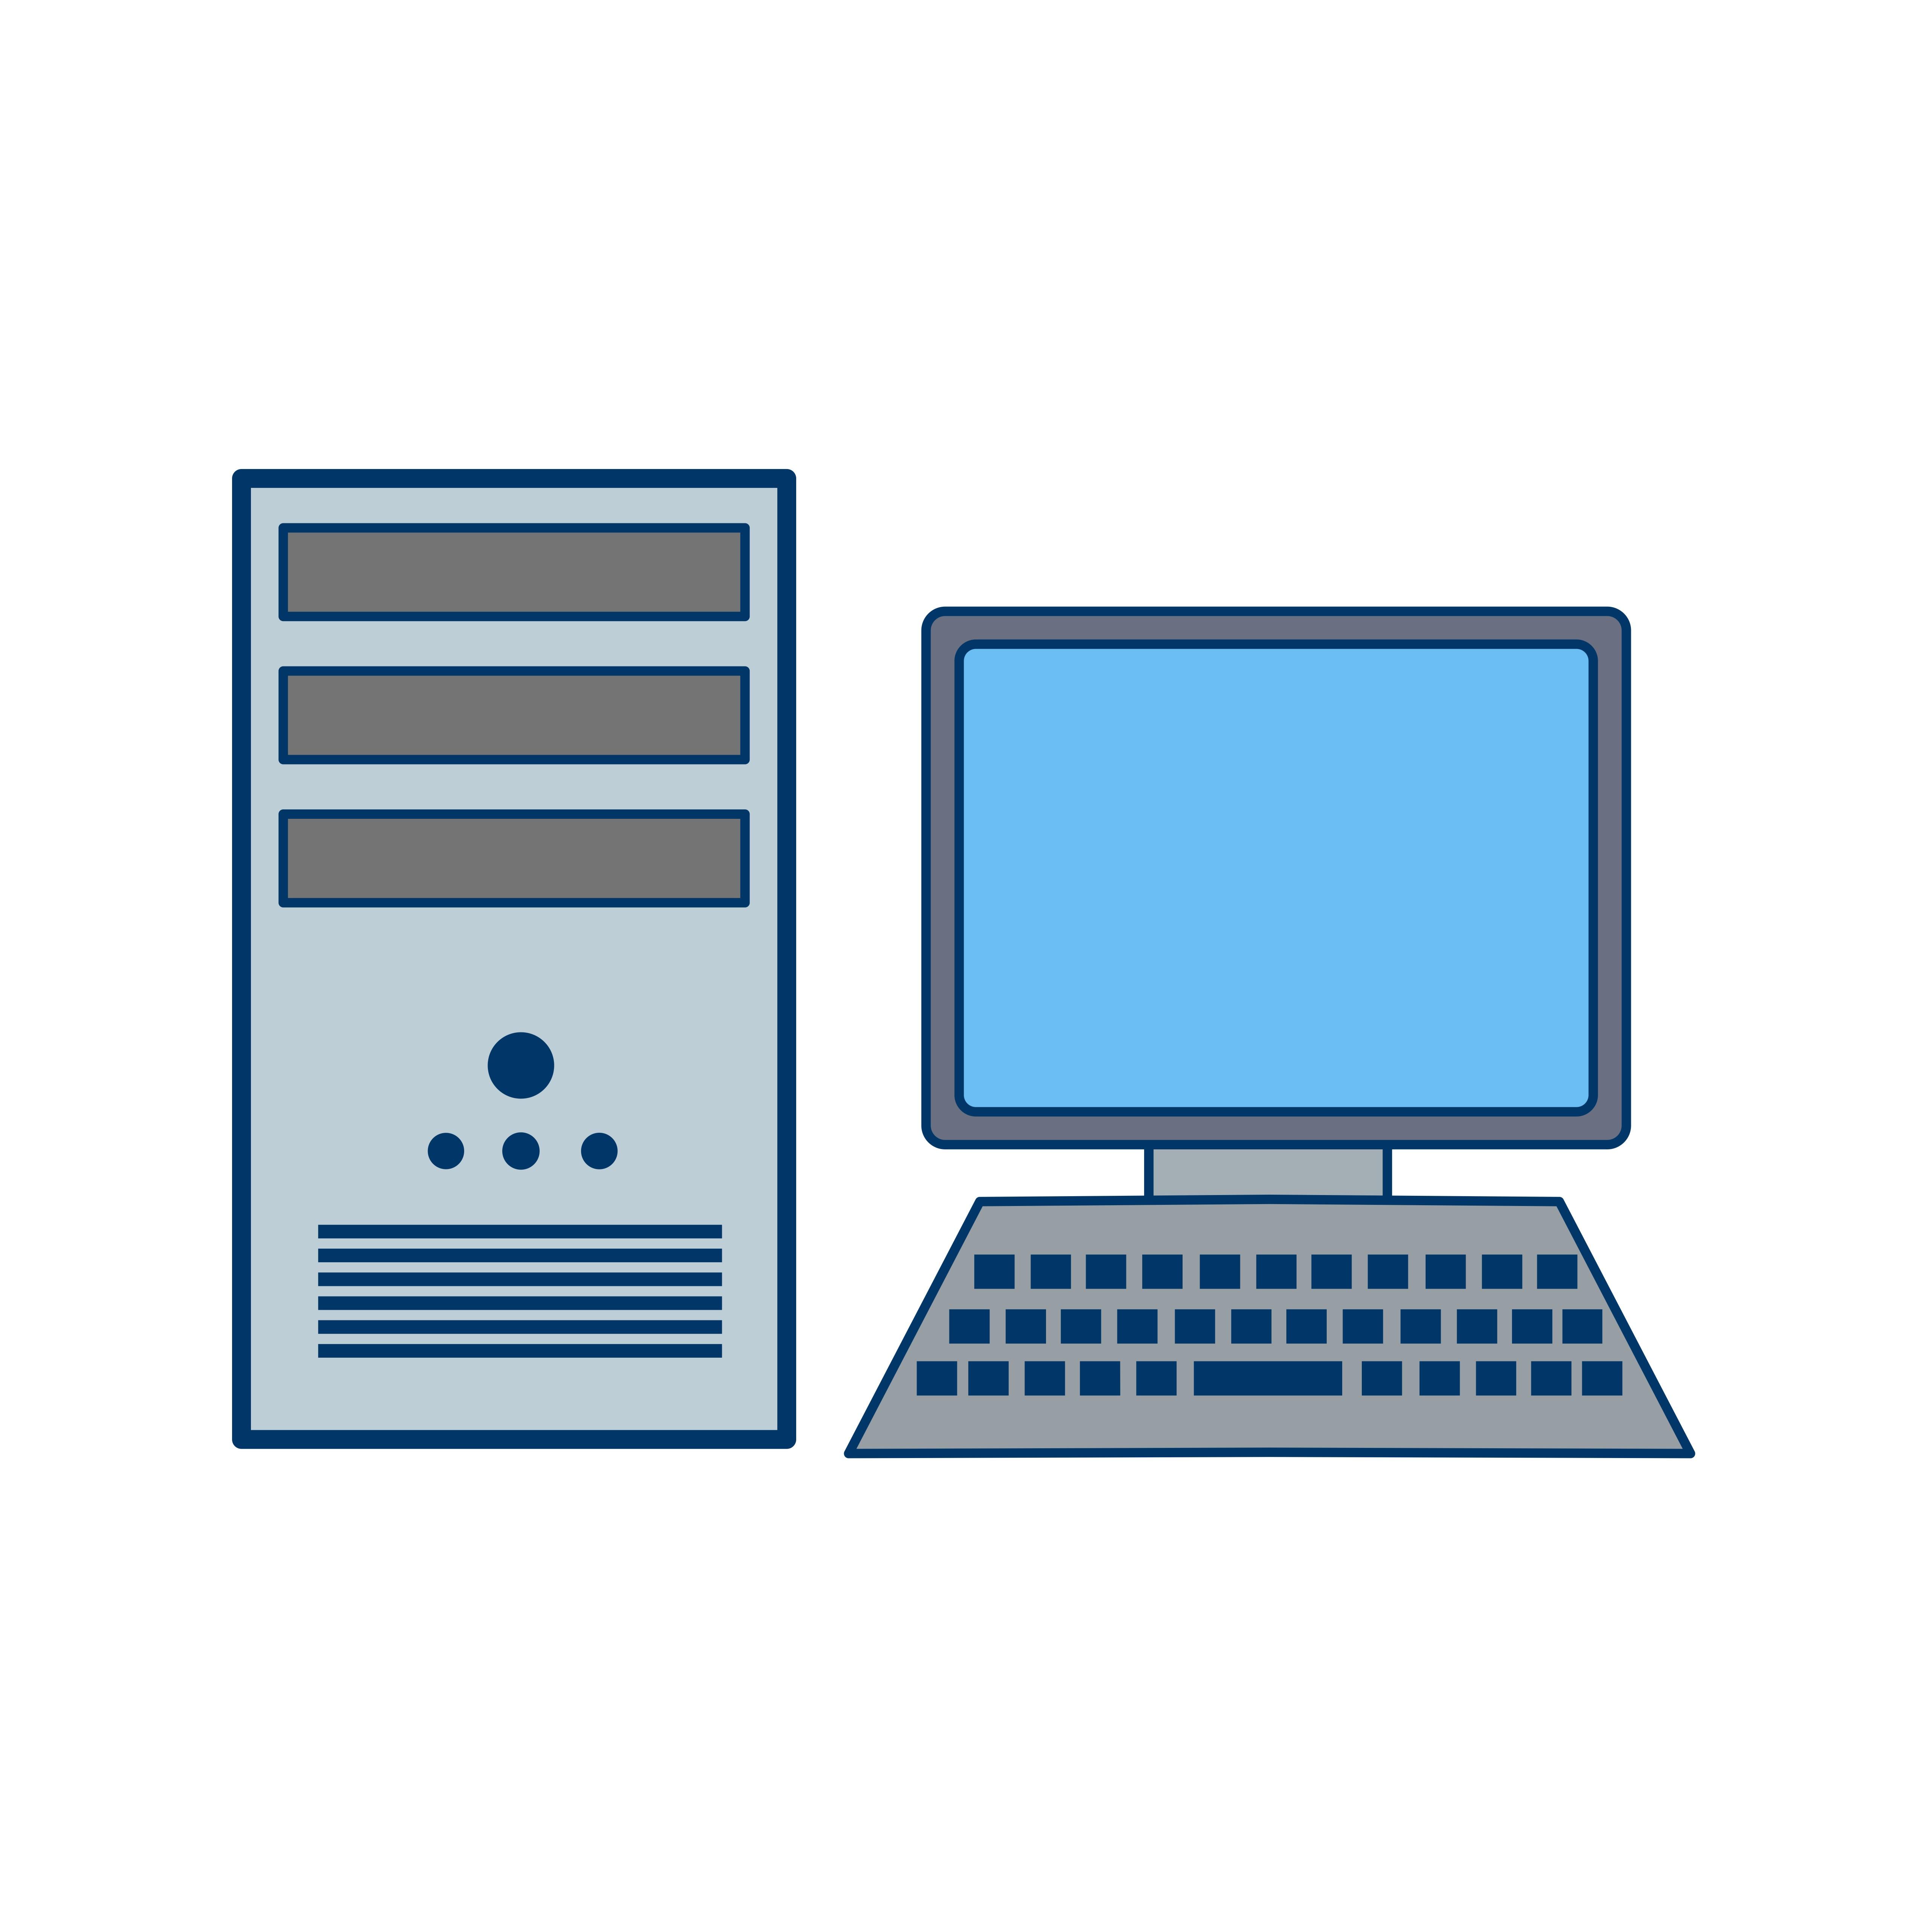 Computer Icon Vector Illustration - Download Free Vectors, Clipart Graphics & Vector Art